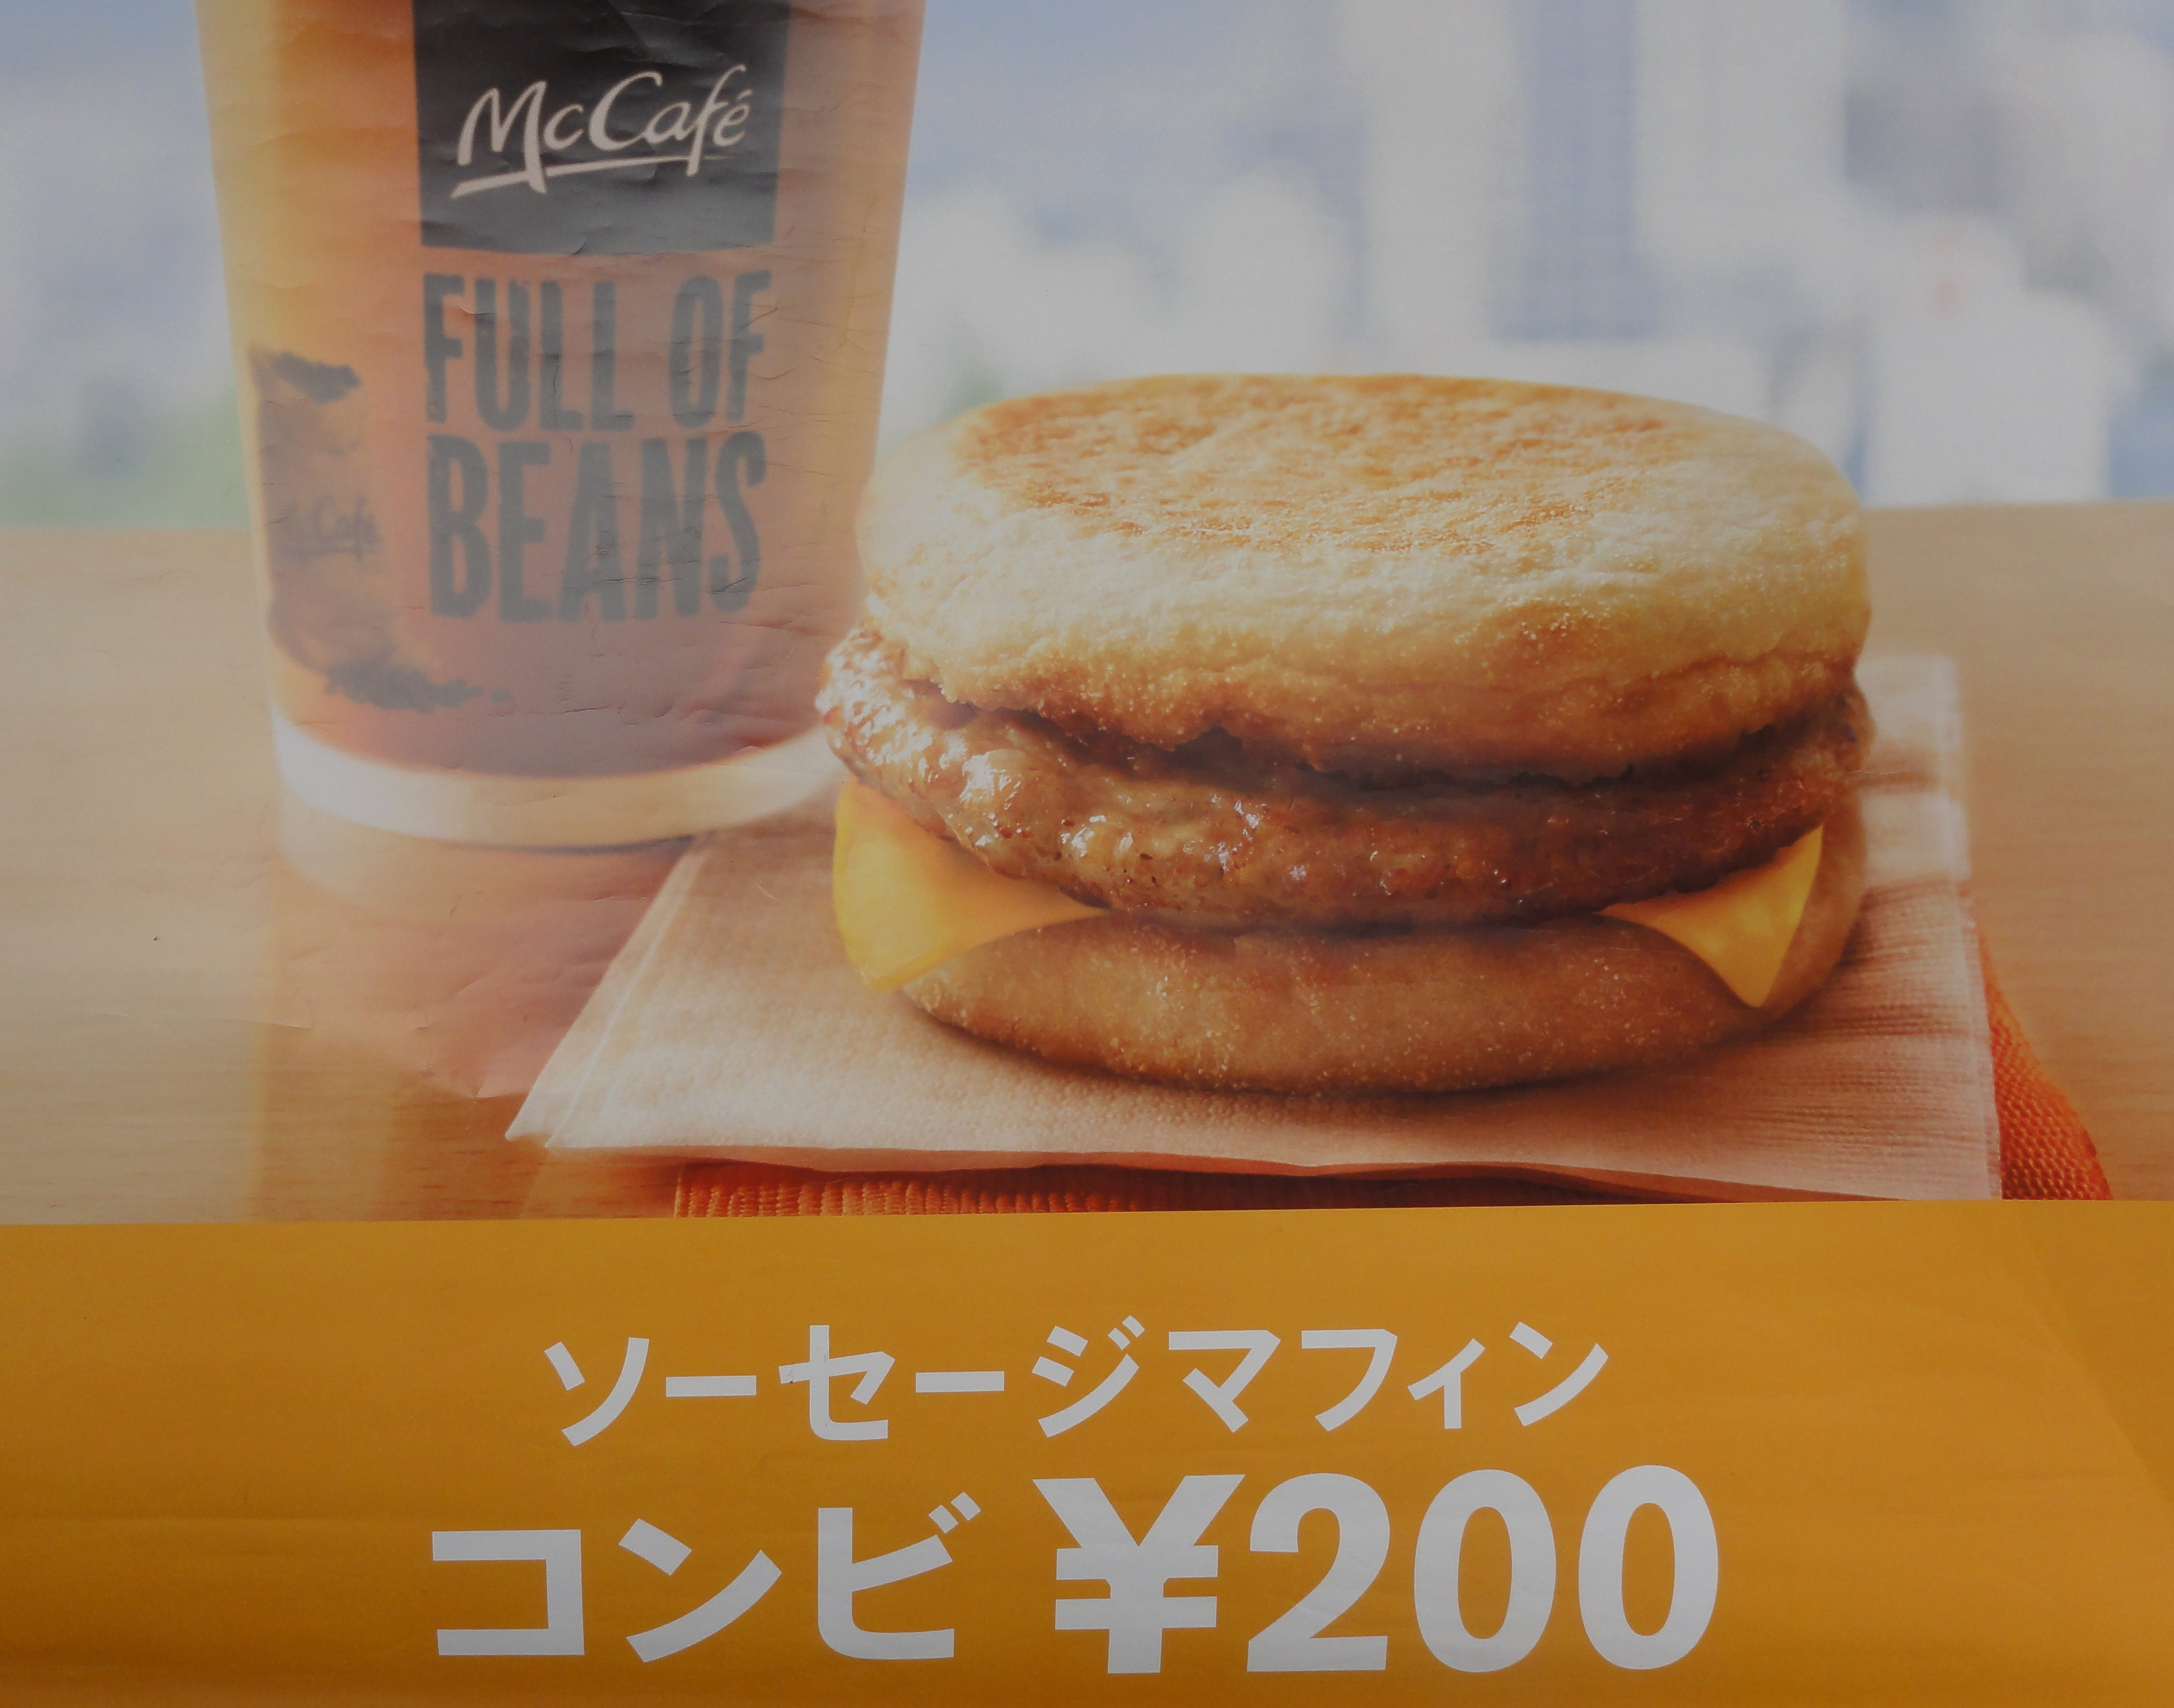 McDonald's sign in katakana Japanese alphabet